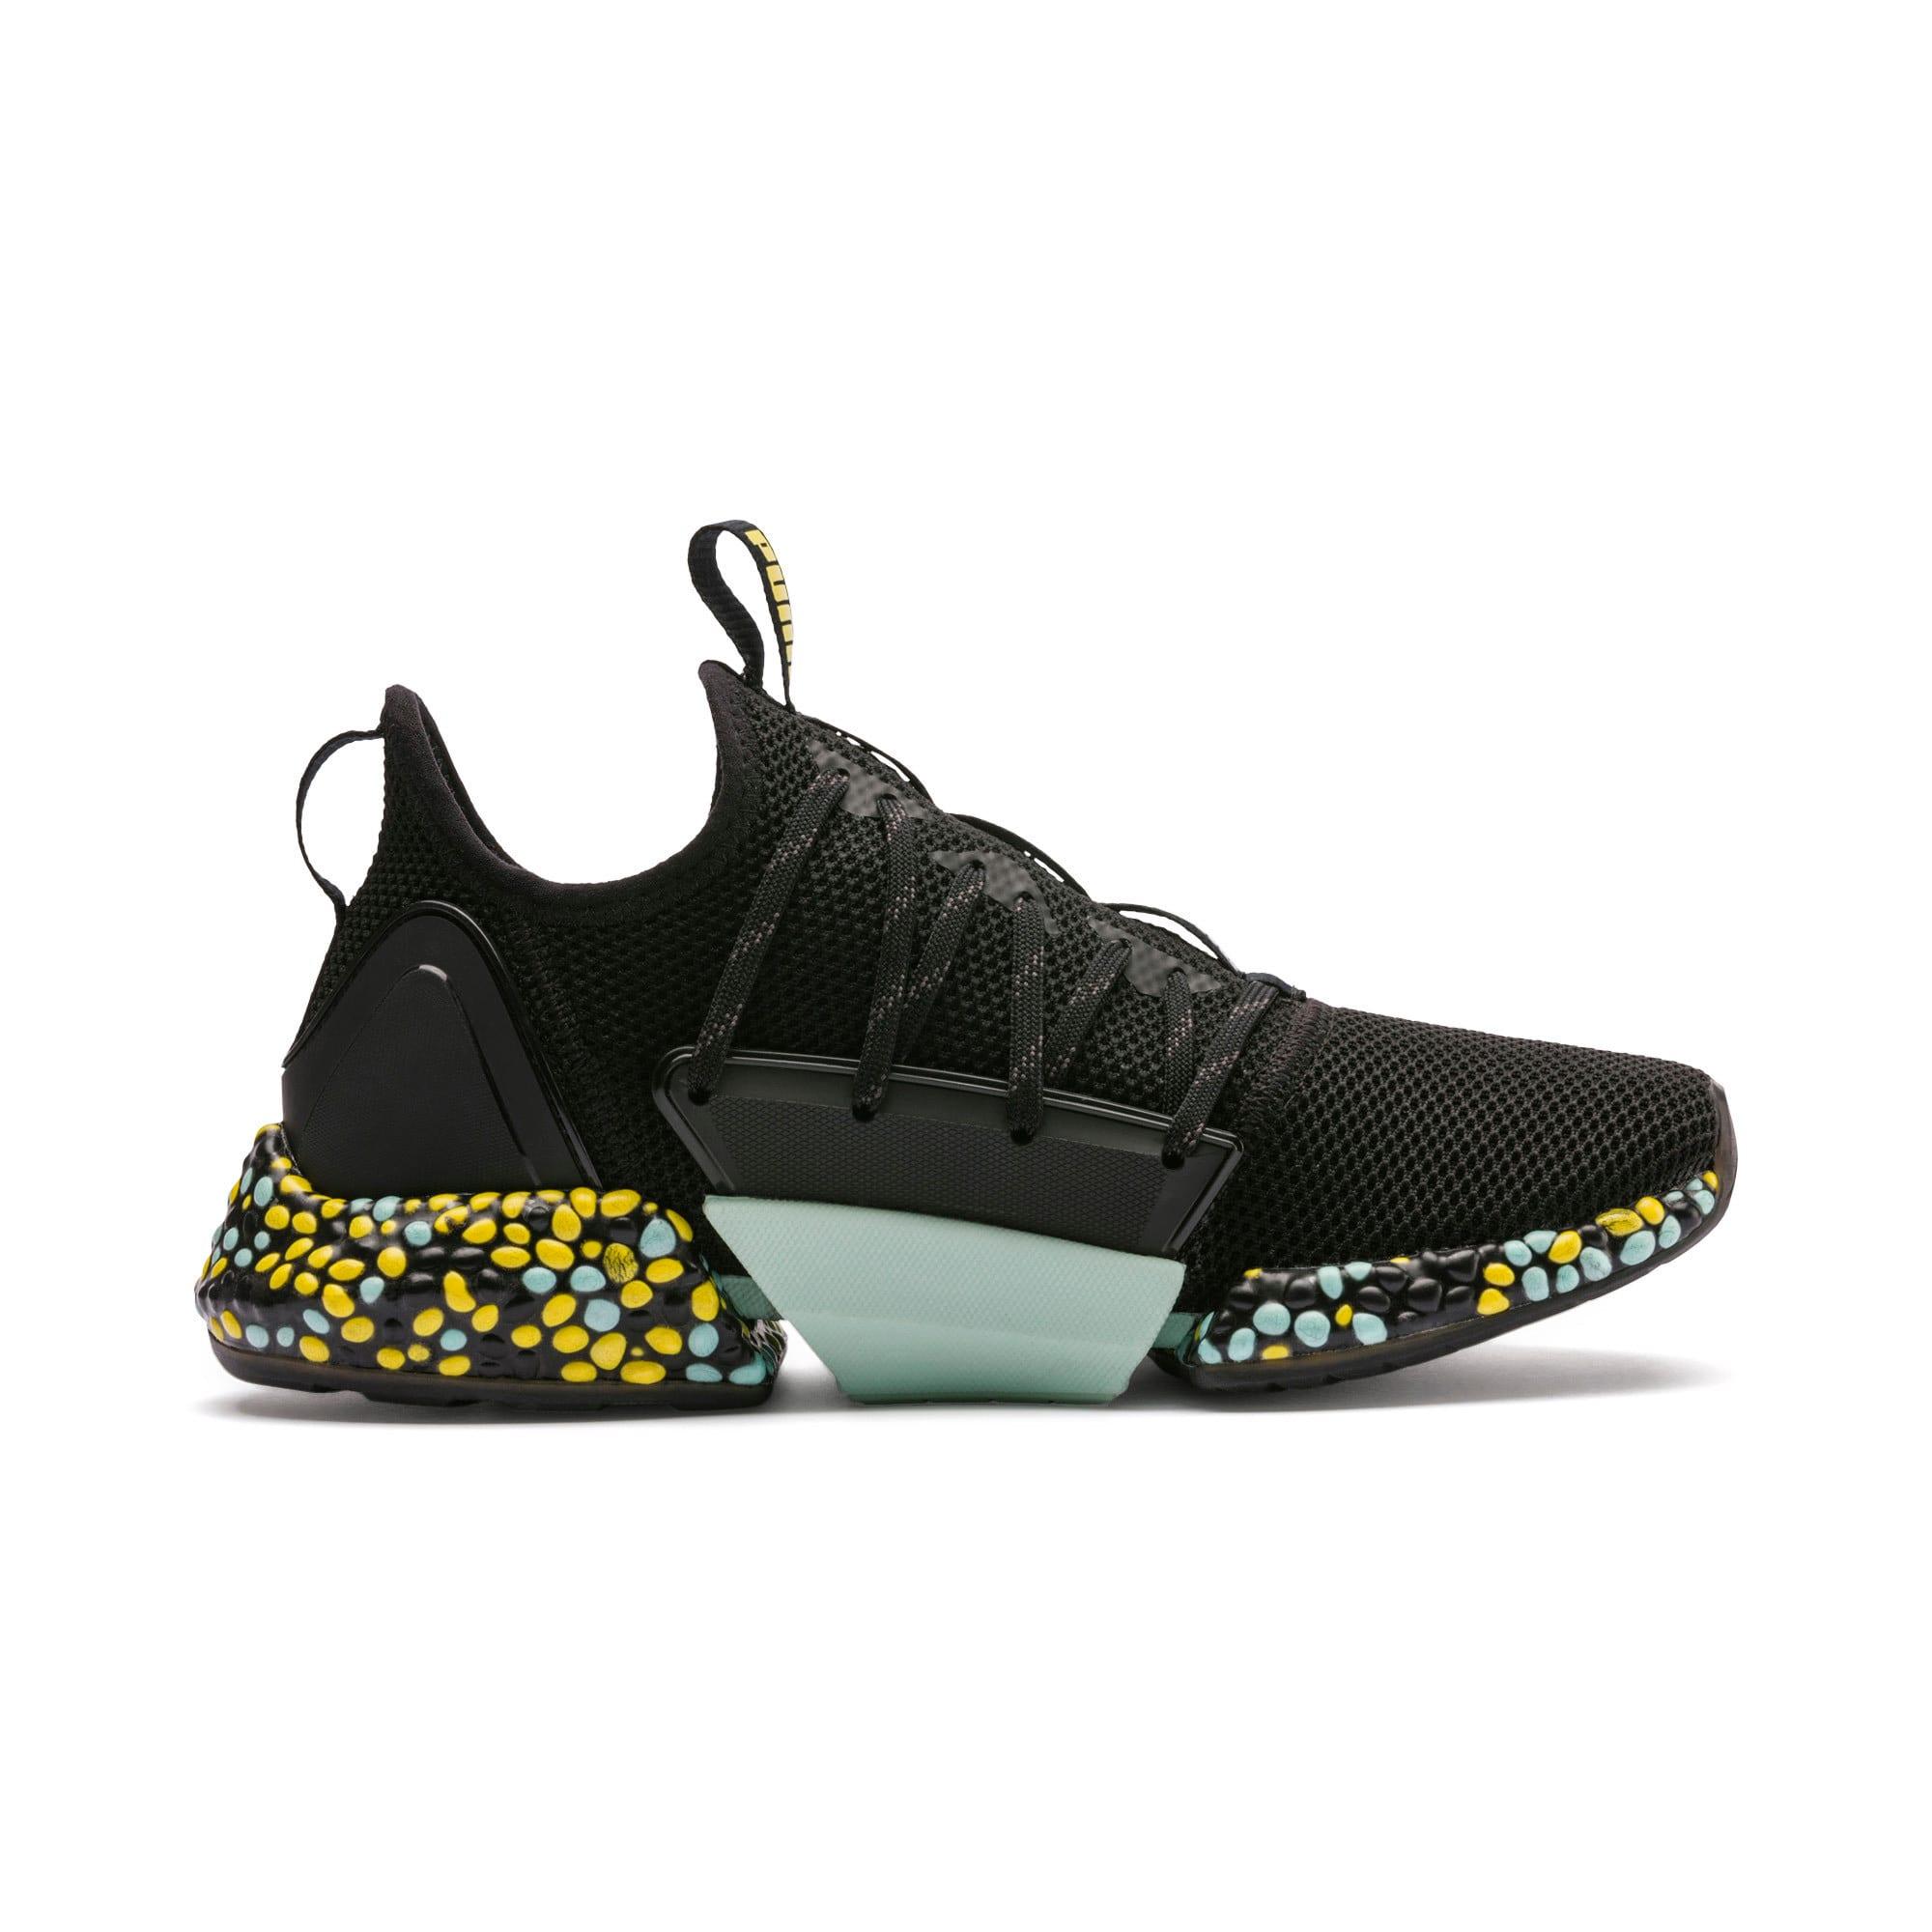 Thumbnail 6 of Hybrid Rocket Women's Running Shoes, Black-Fair Aqua-Yellow, medium